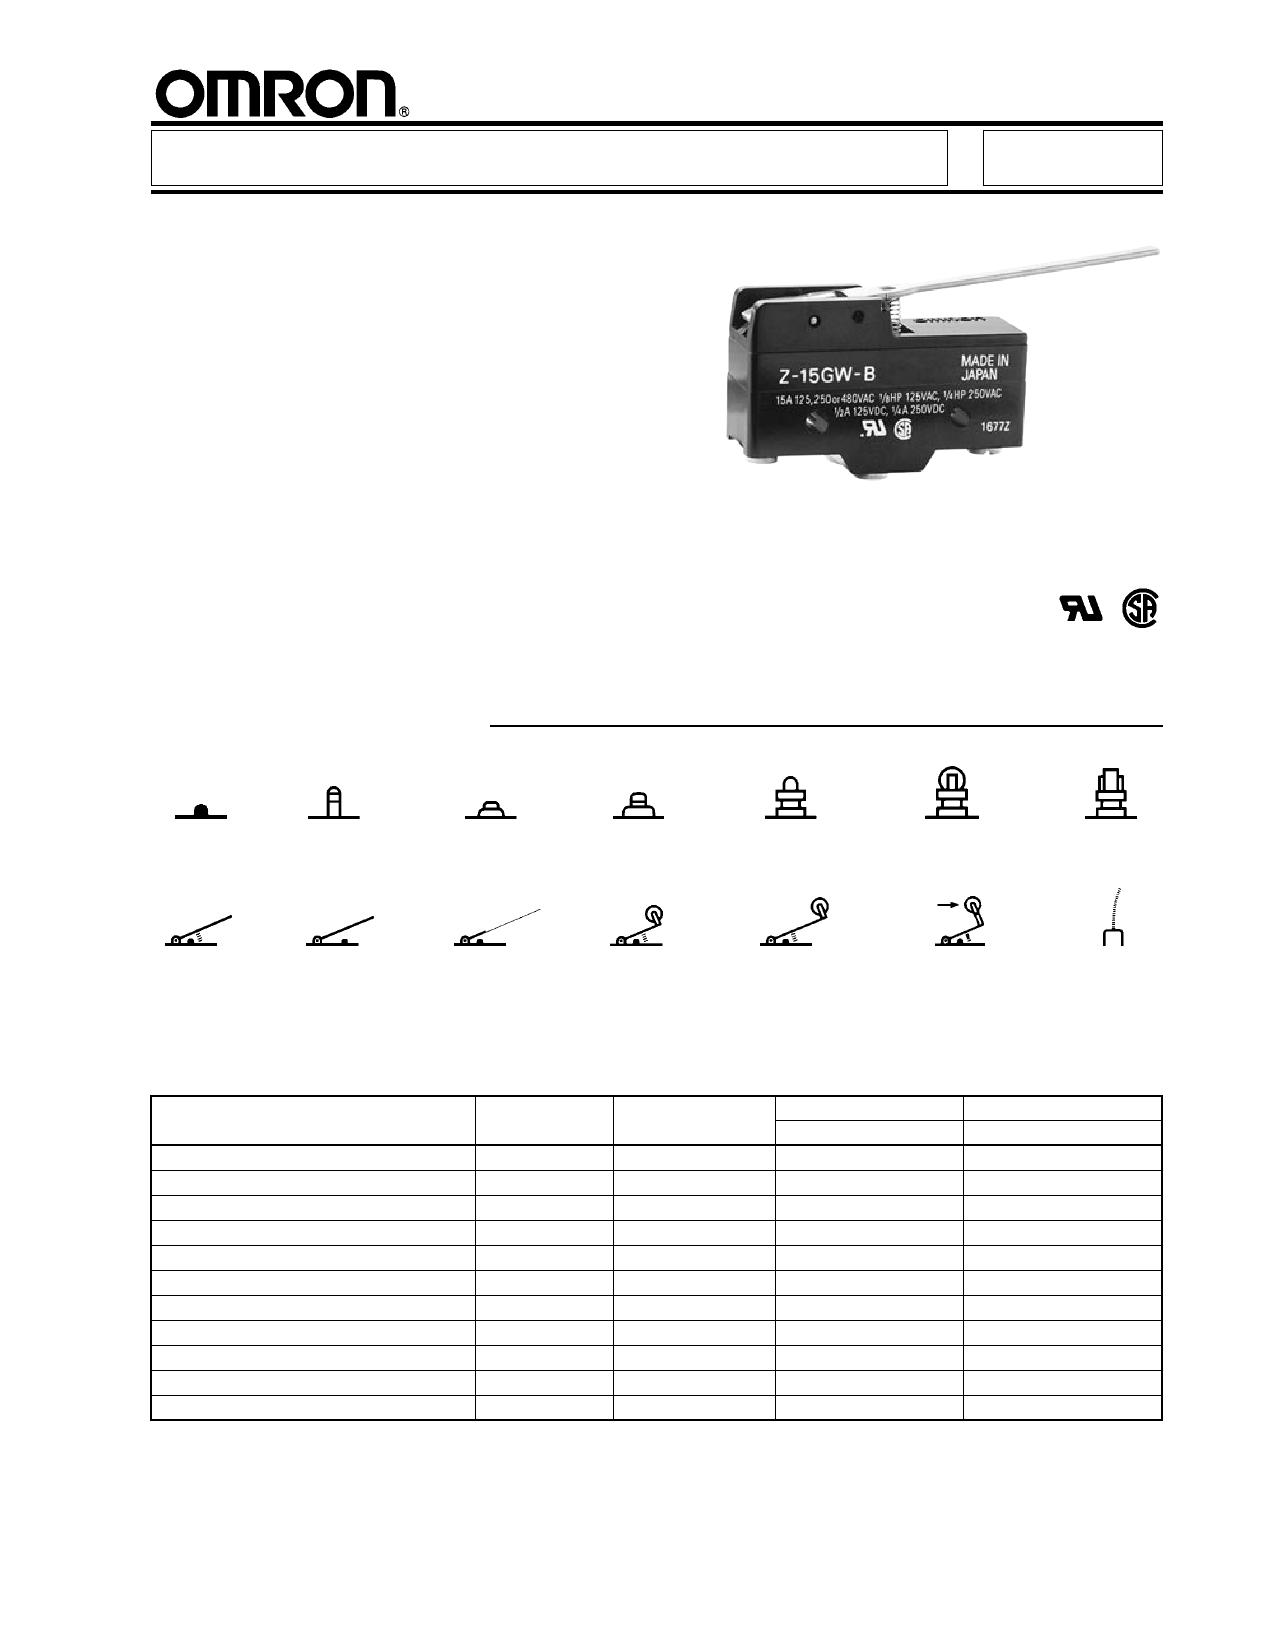 Z-15GW4 datasheet